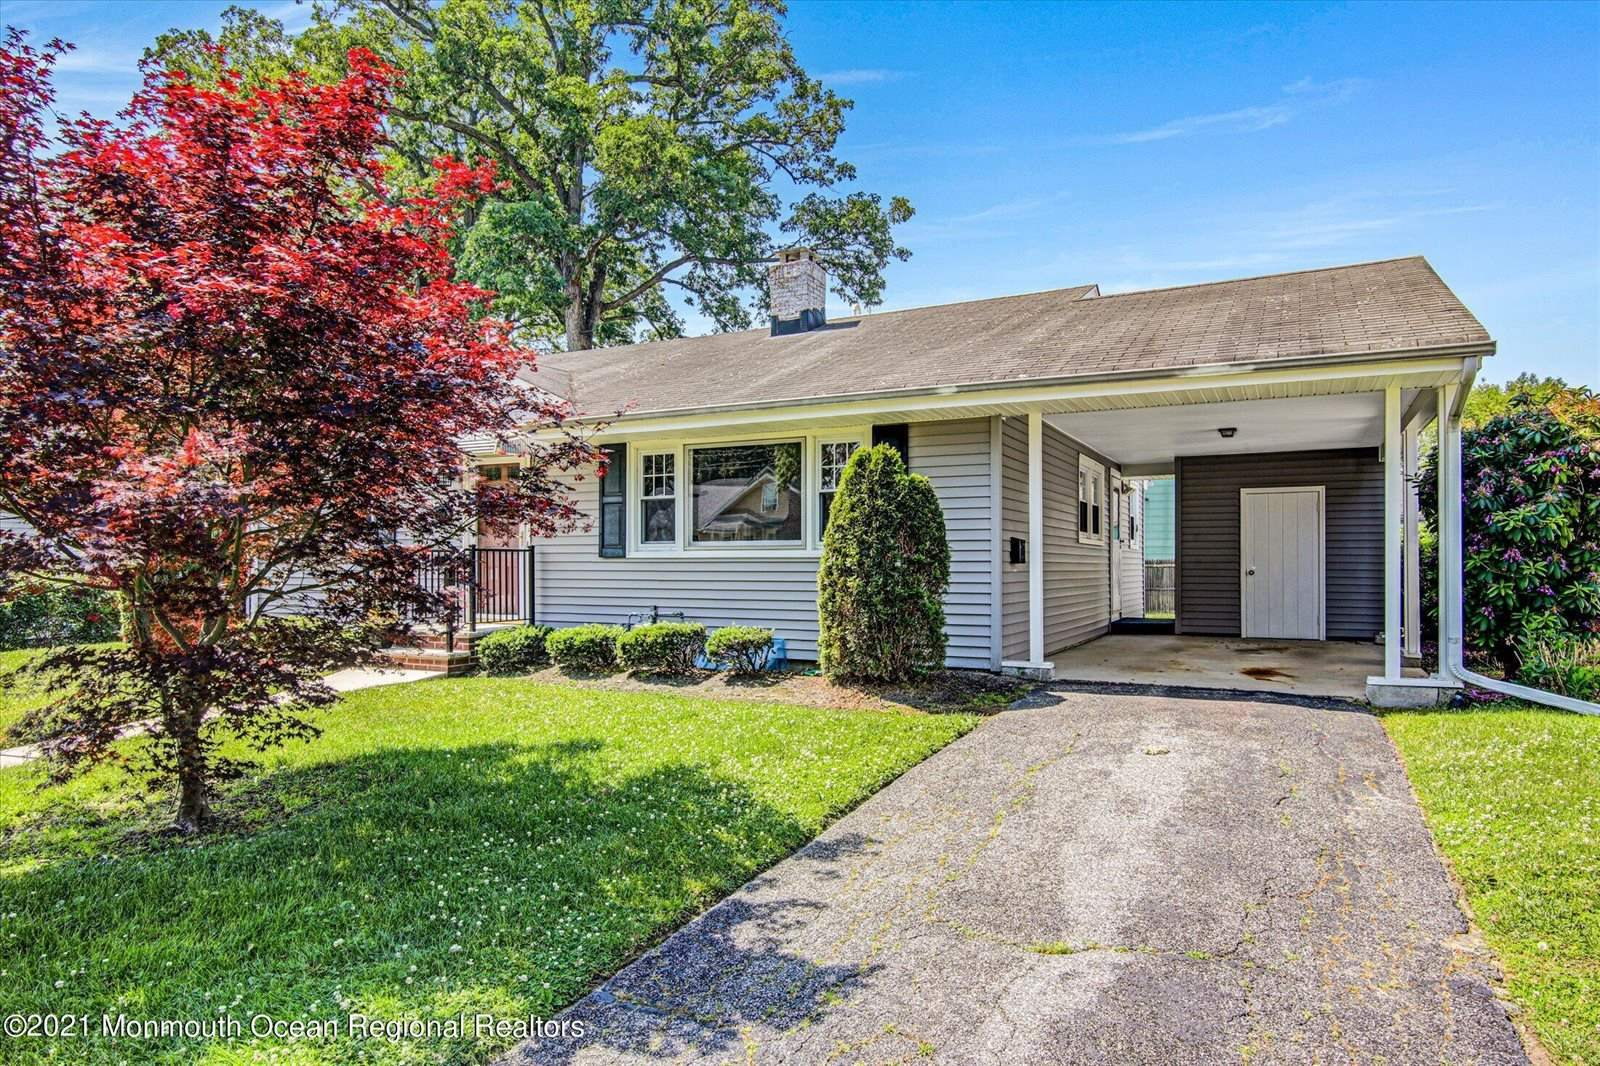 1900 South Wanamassa Drive, Ocean Township, NJ 07712